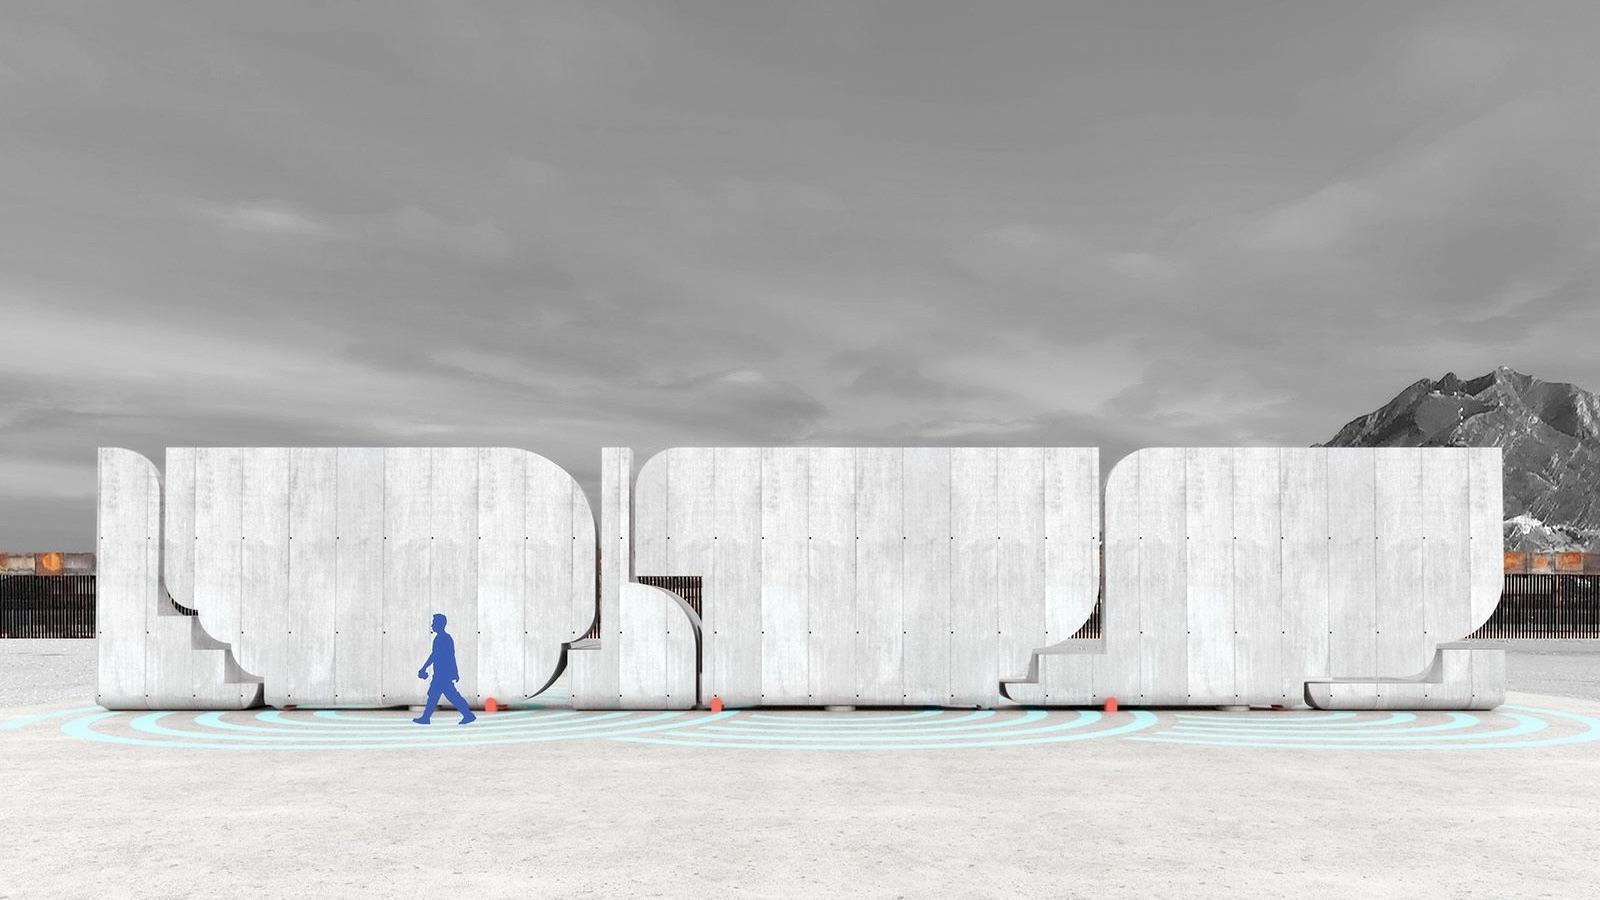 2020 Unbuilt Architecture and Design Awards